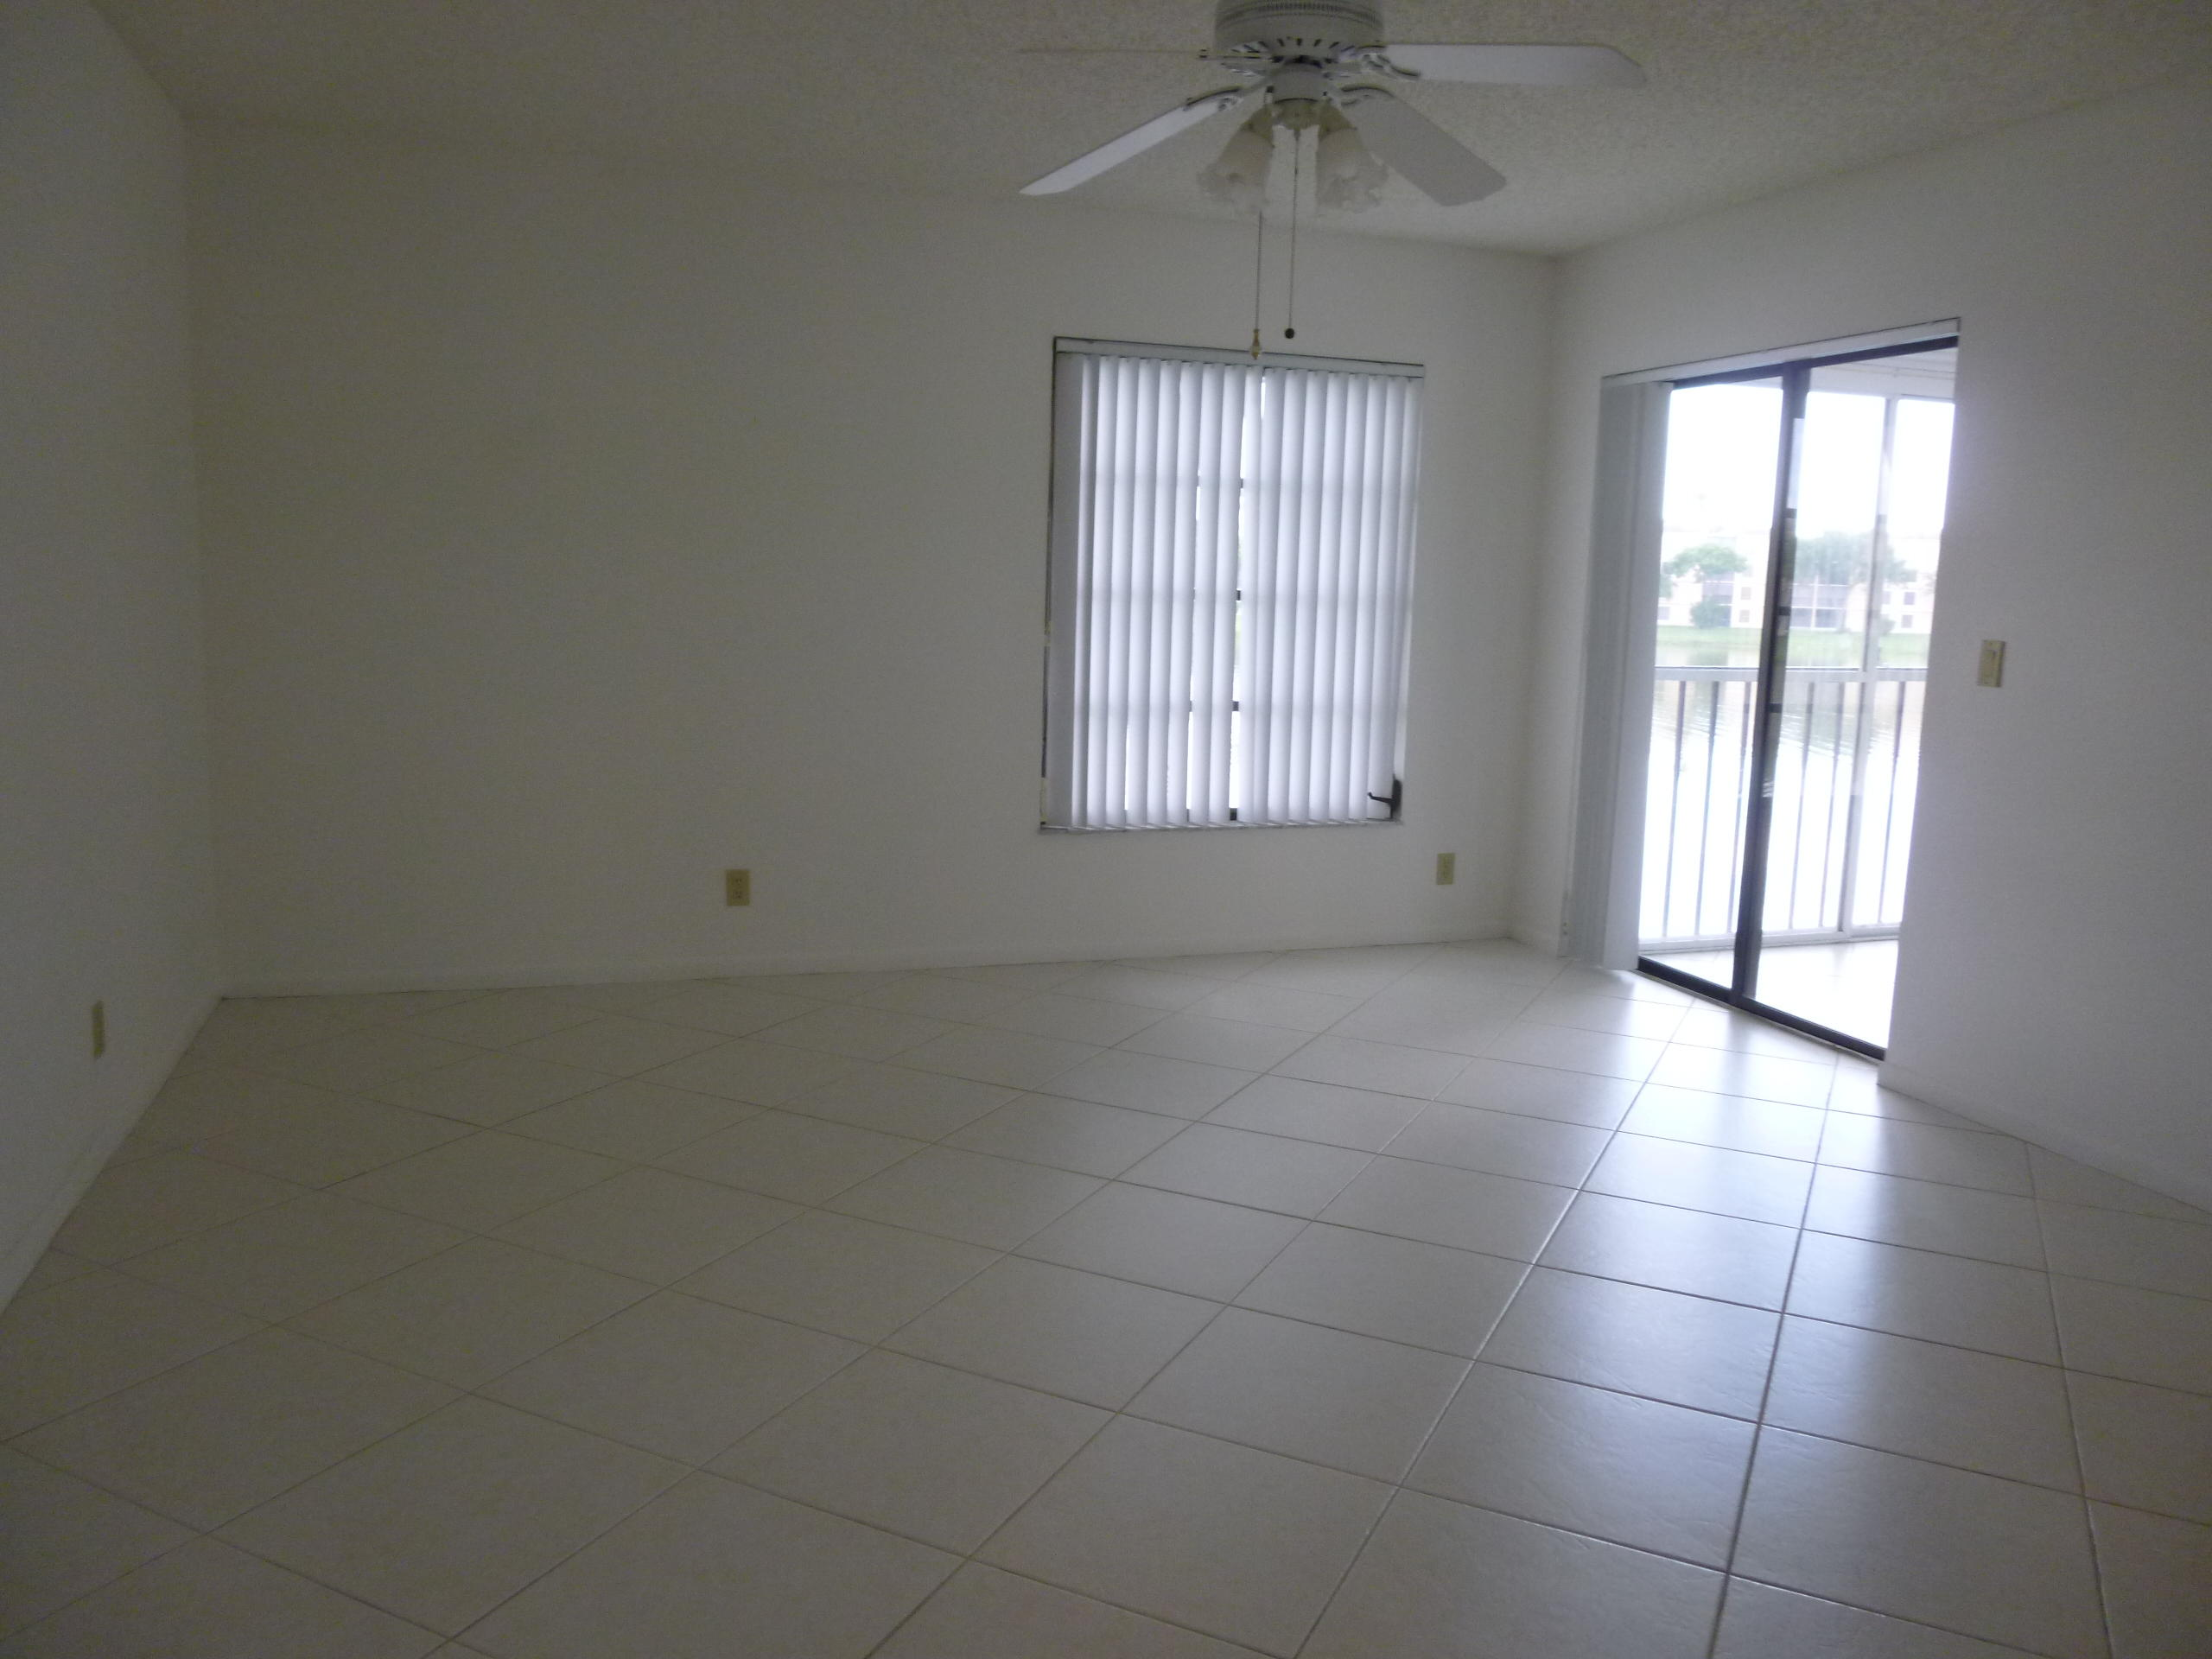 6193 Pointe Regal Circle 206 Delray Beach, FL 33484 photo 12